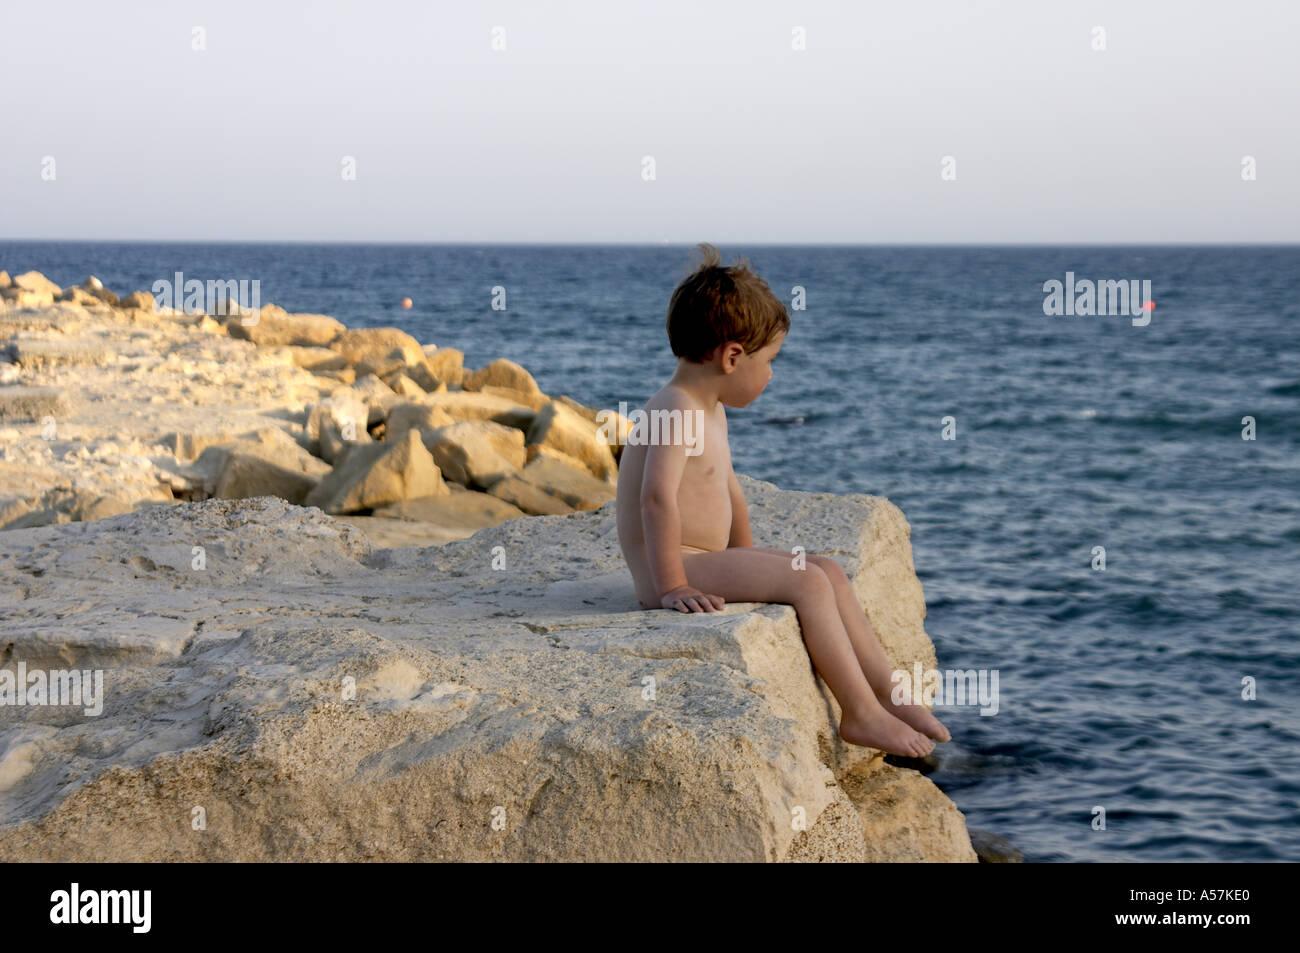 Cyprus Nude 27